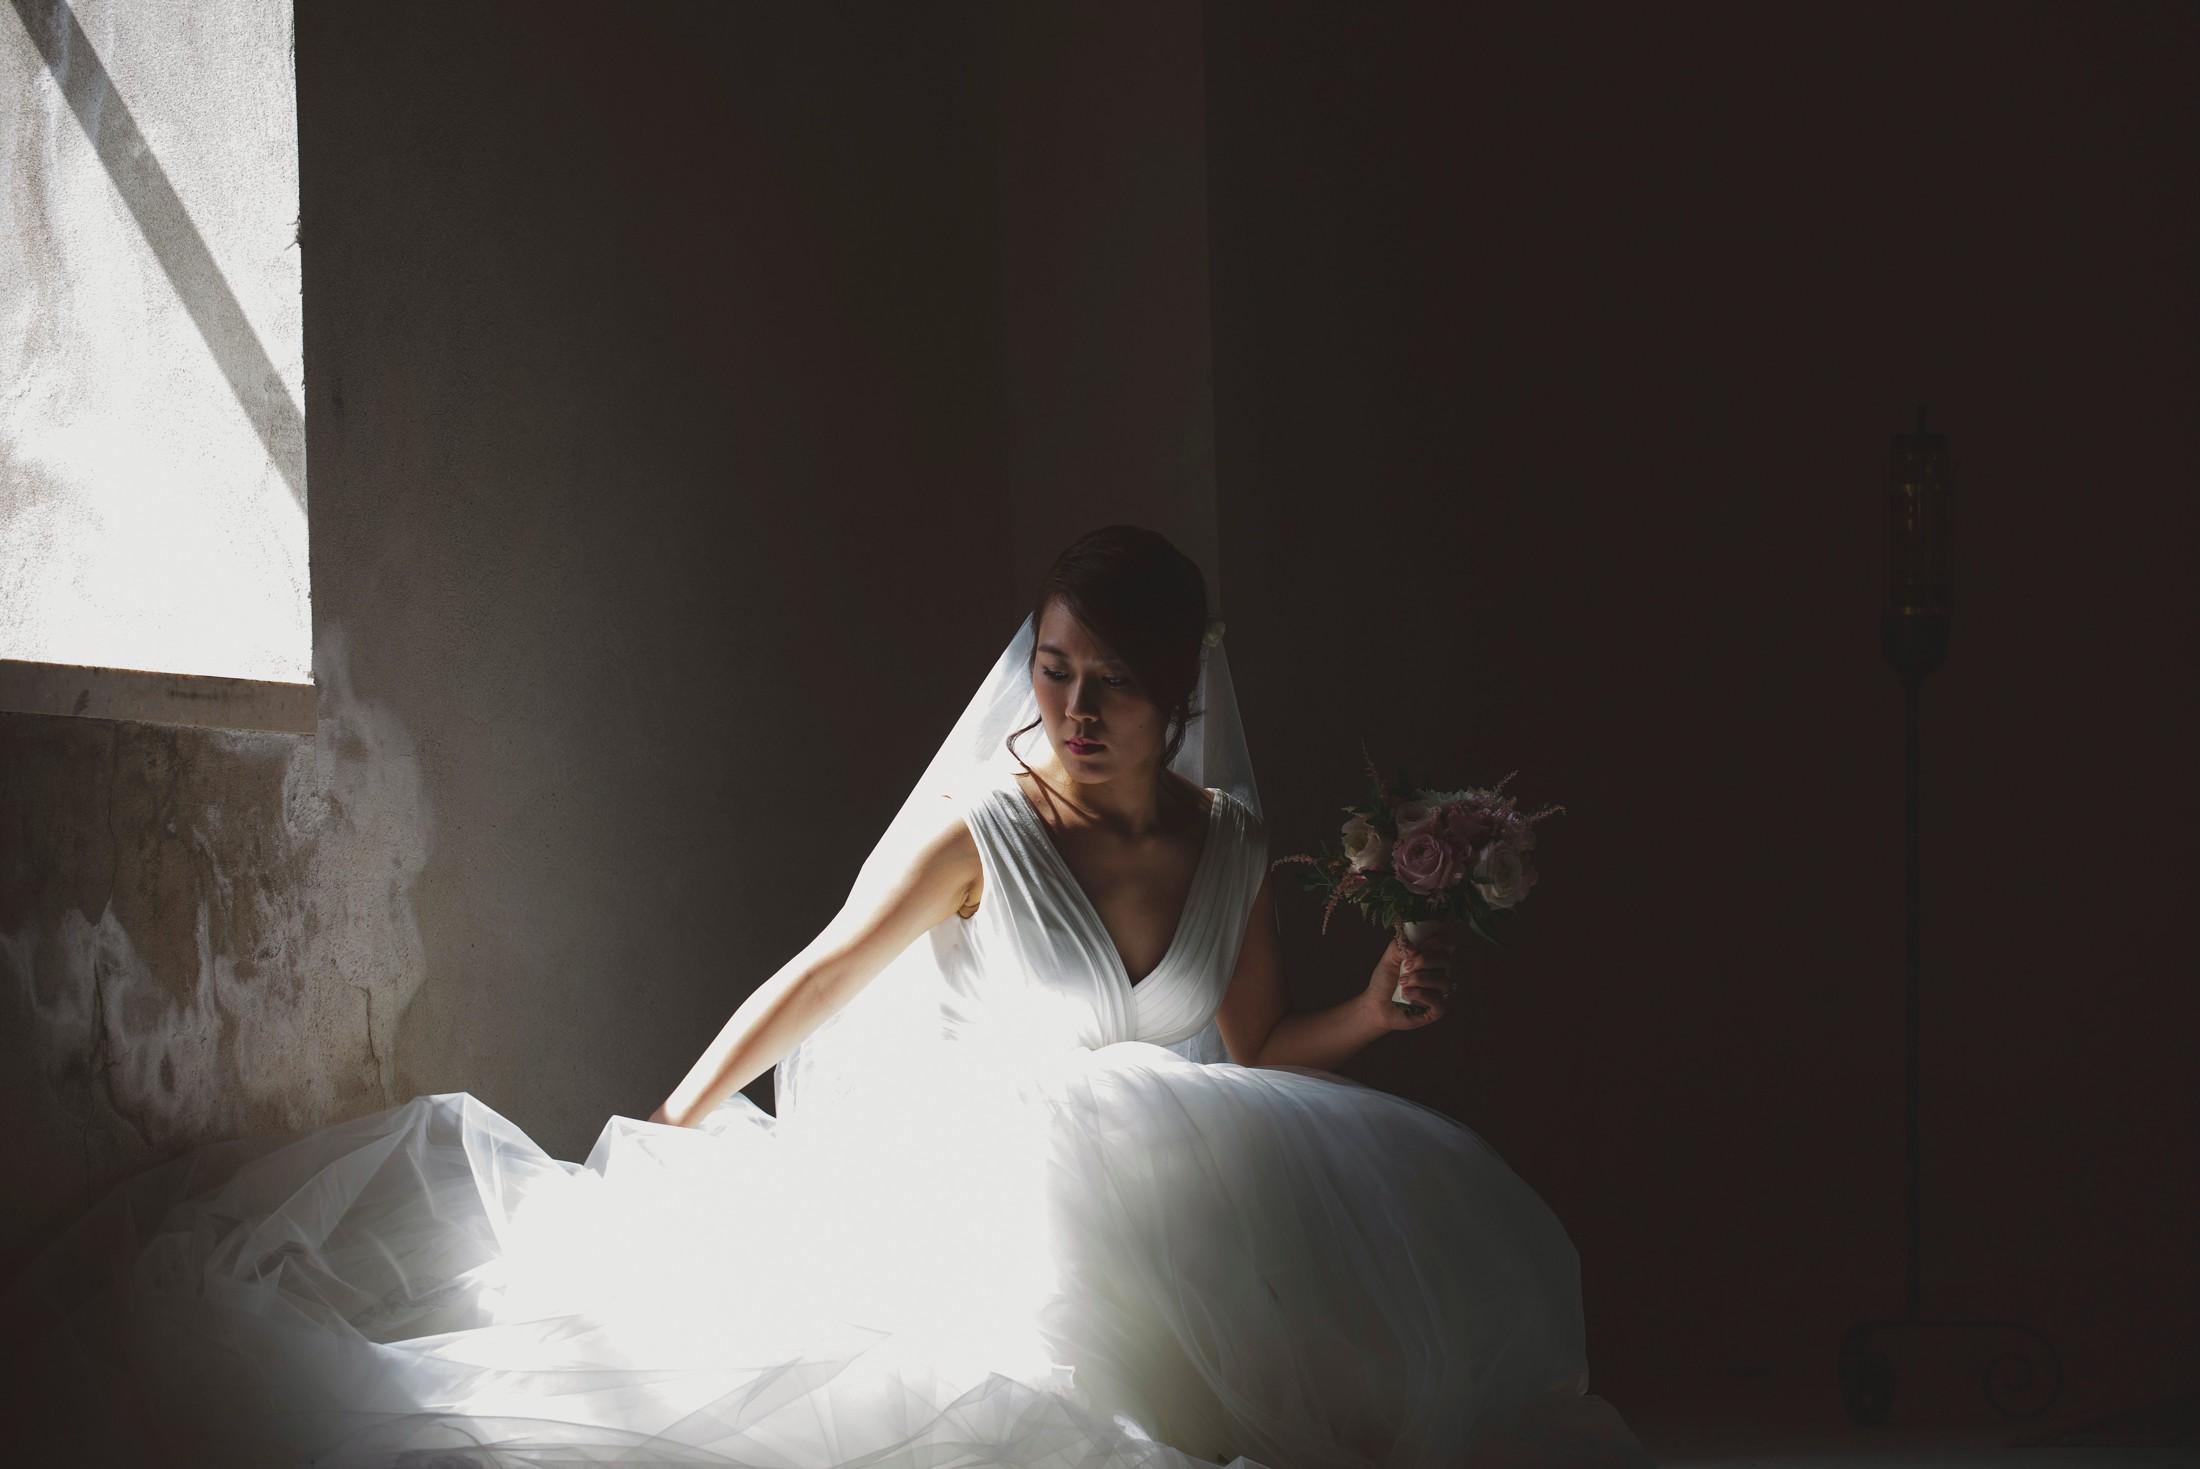 wedding on the amalfi coast the bride adjusts her dress